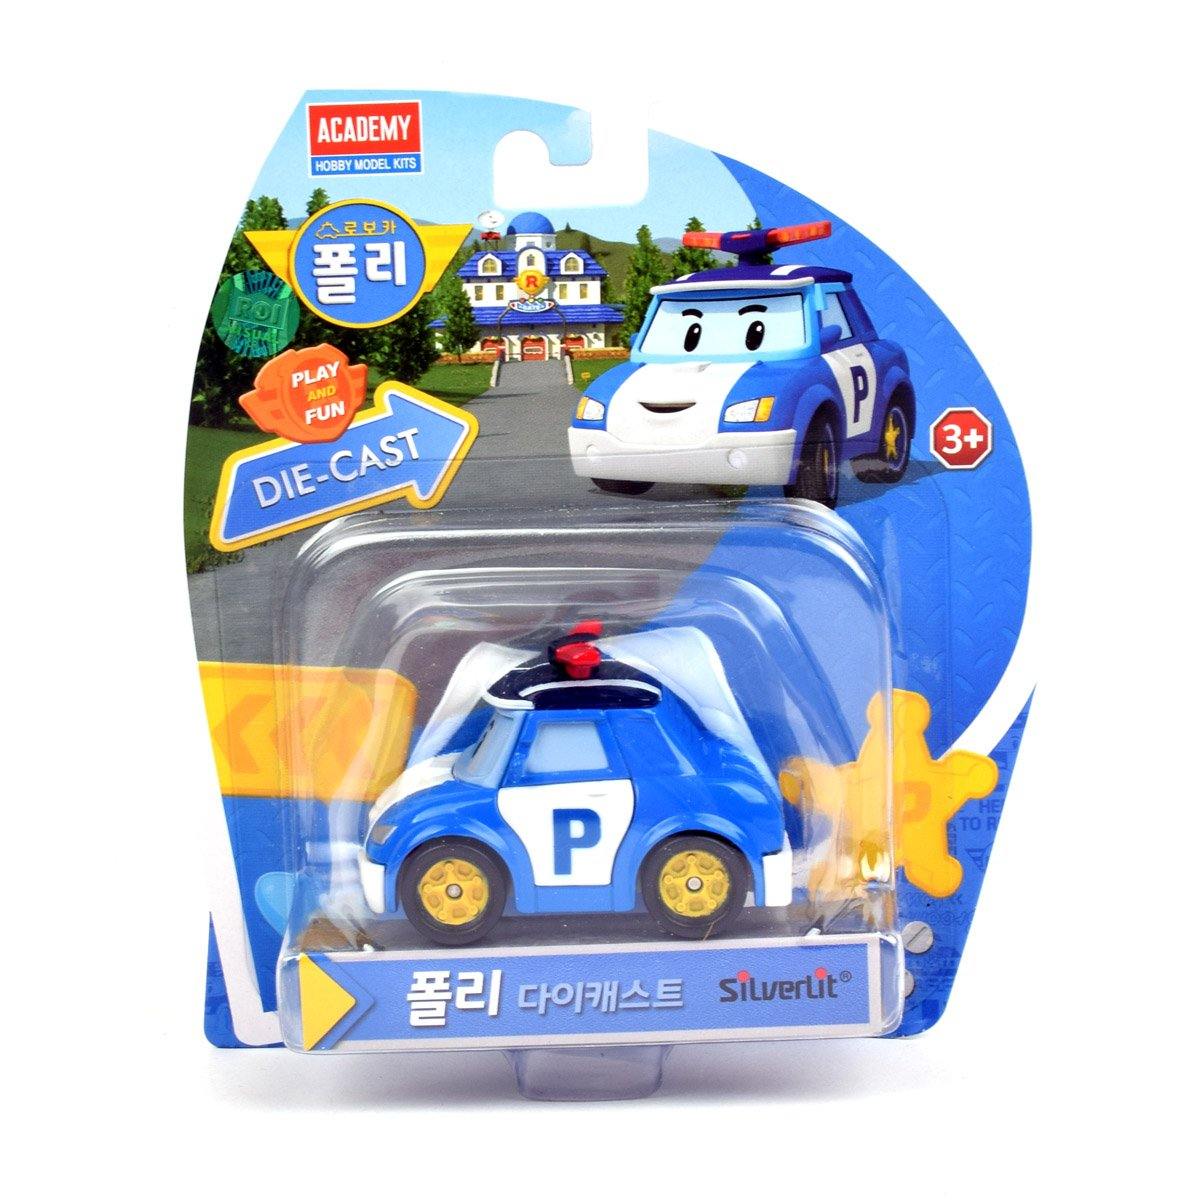 Robocar Poli - Poli (diecasting - not transformers)